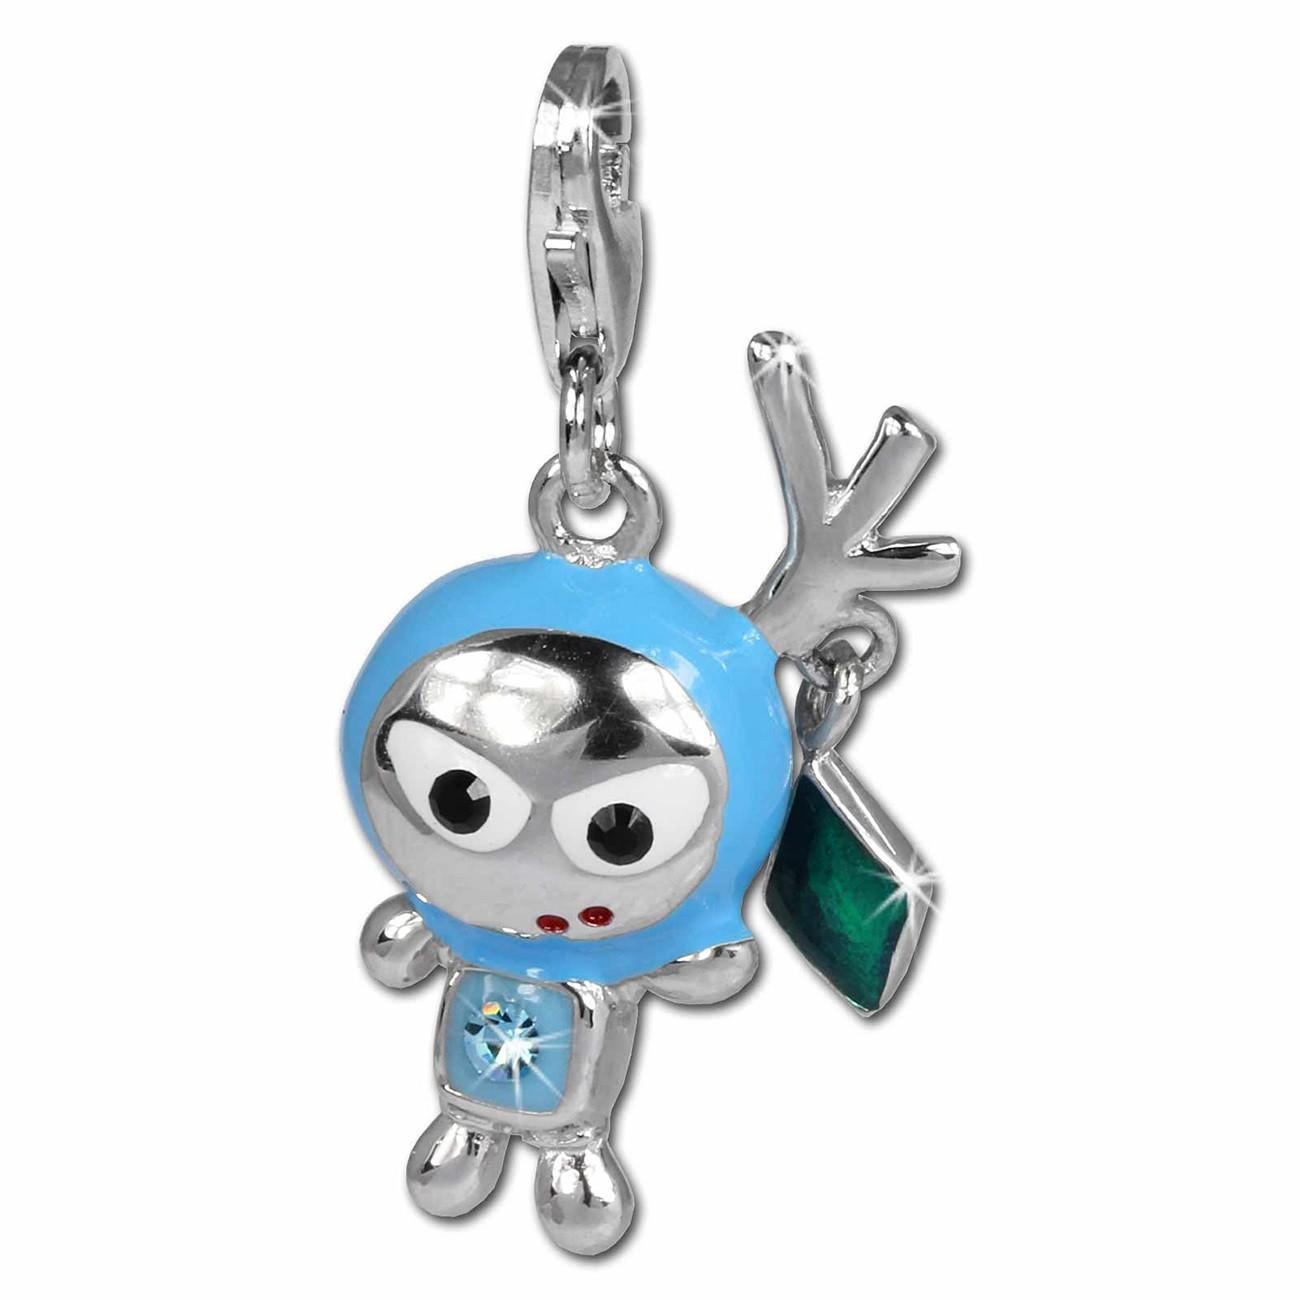 SilberDream Glitzer Charm SpaceBodo blau Zirkonia Kristall 925 GSC527H